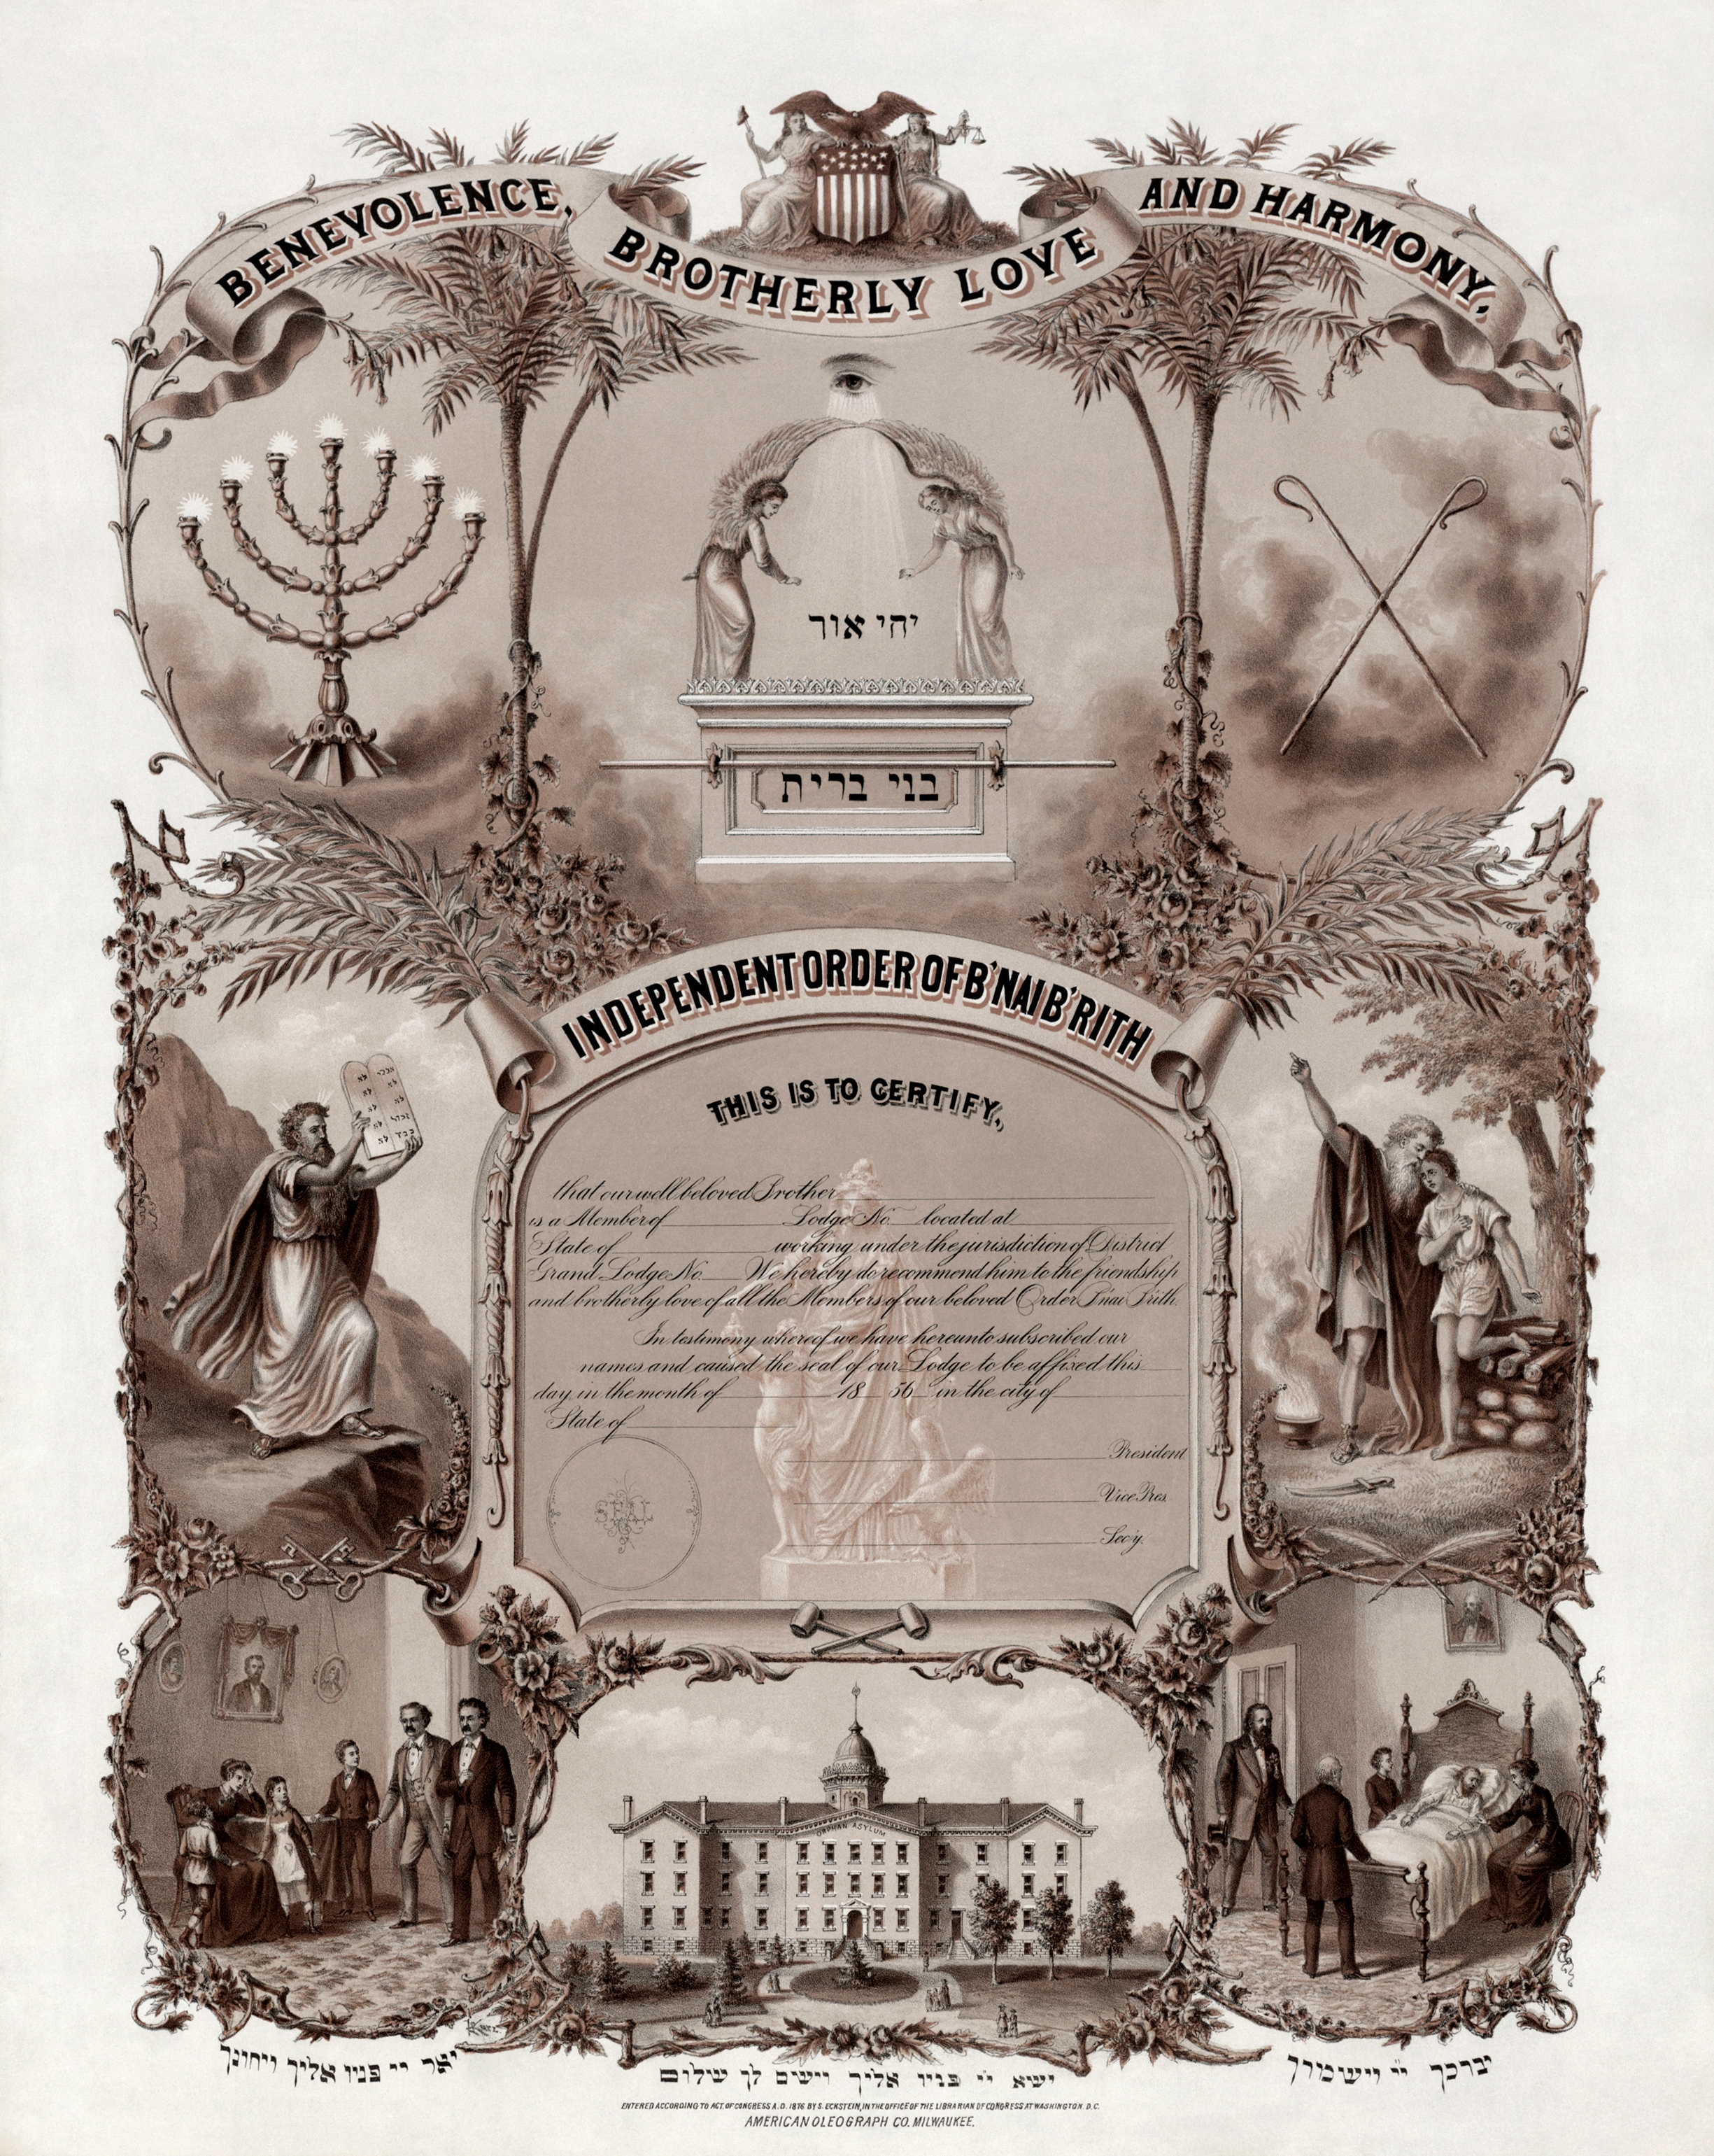 Filebnai brith membership certificate 1876g wikipedia filebnai brith membership certificate xflitez Choice Image